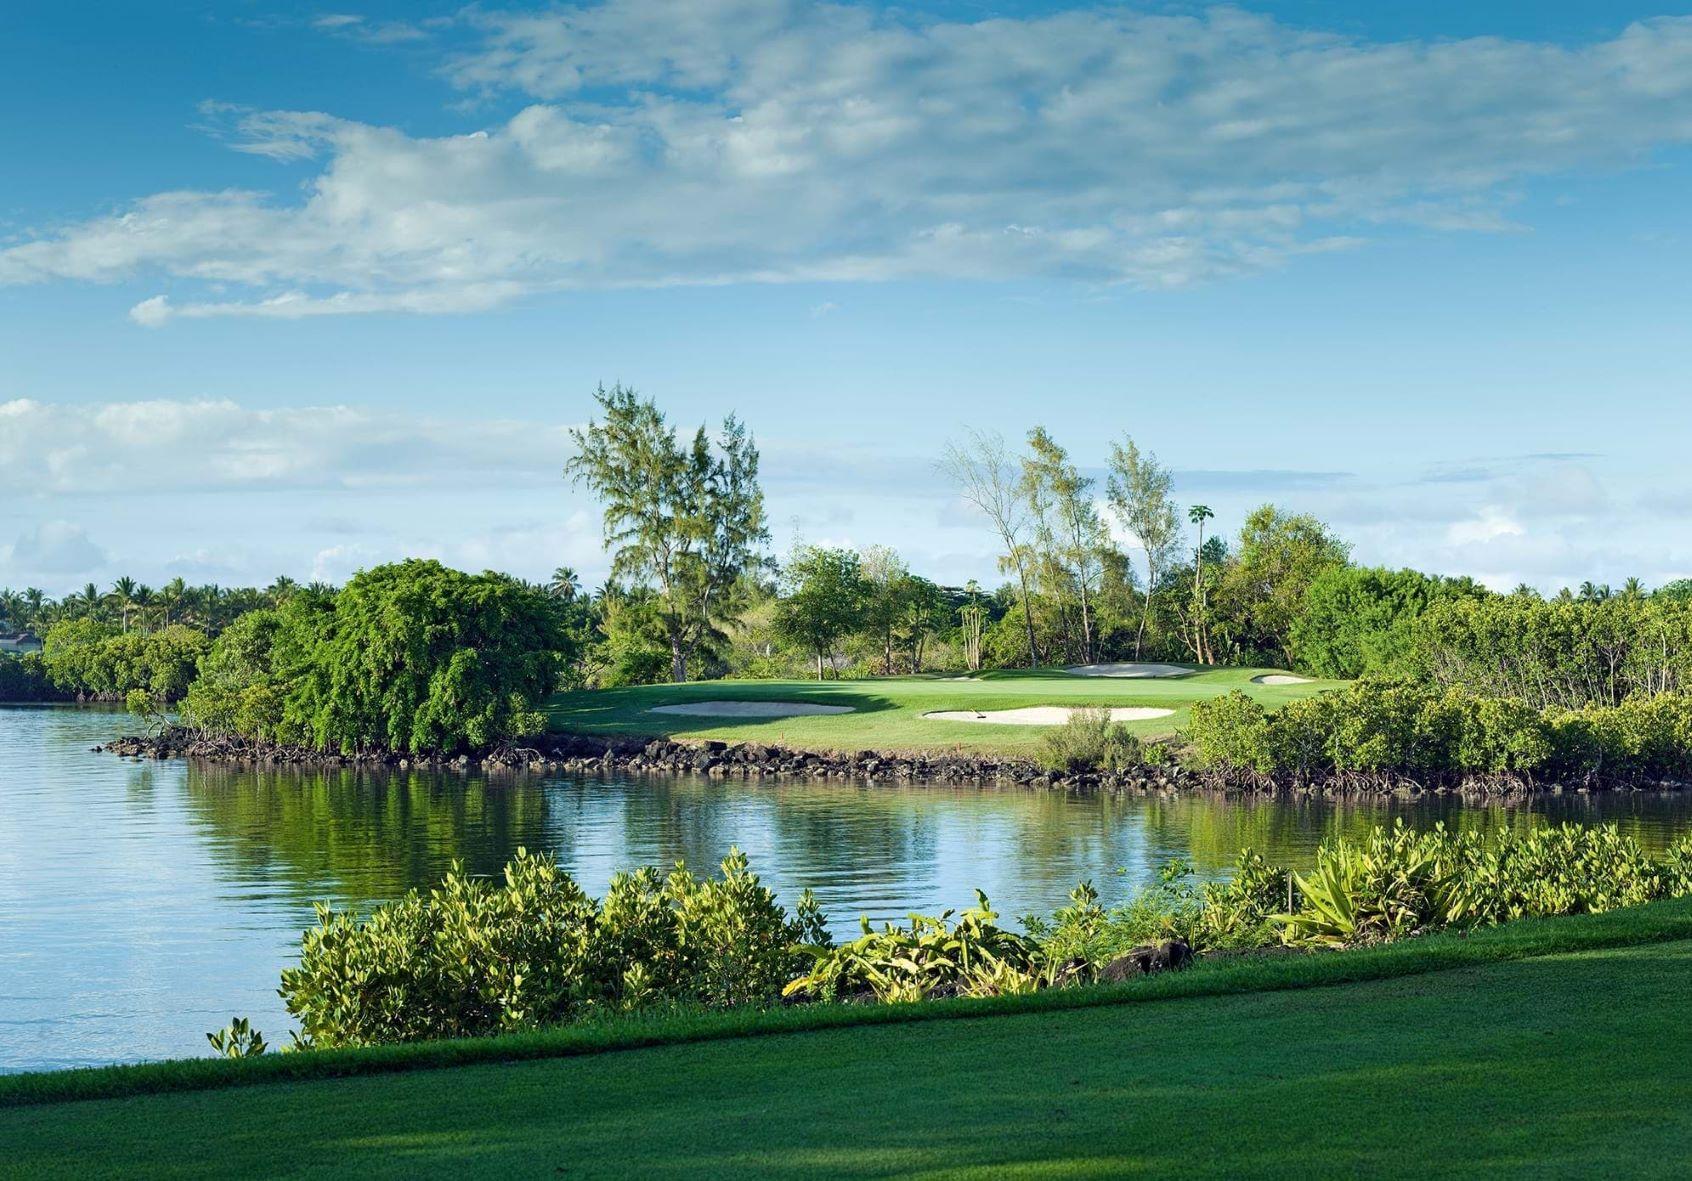 belle-mare-plage-legend-golf-course-201